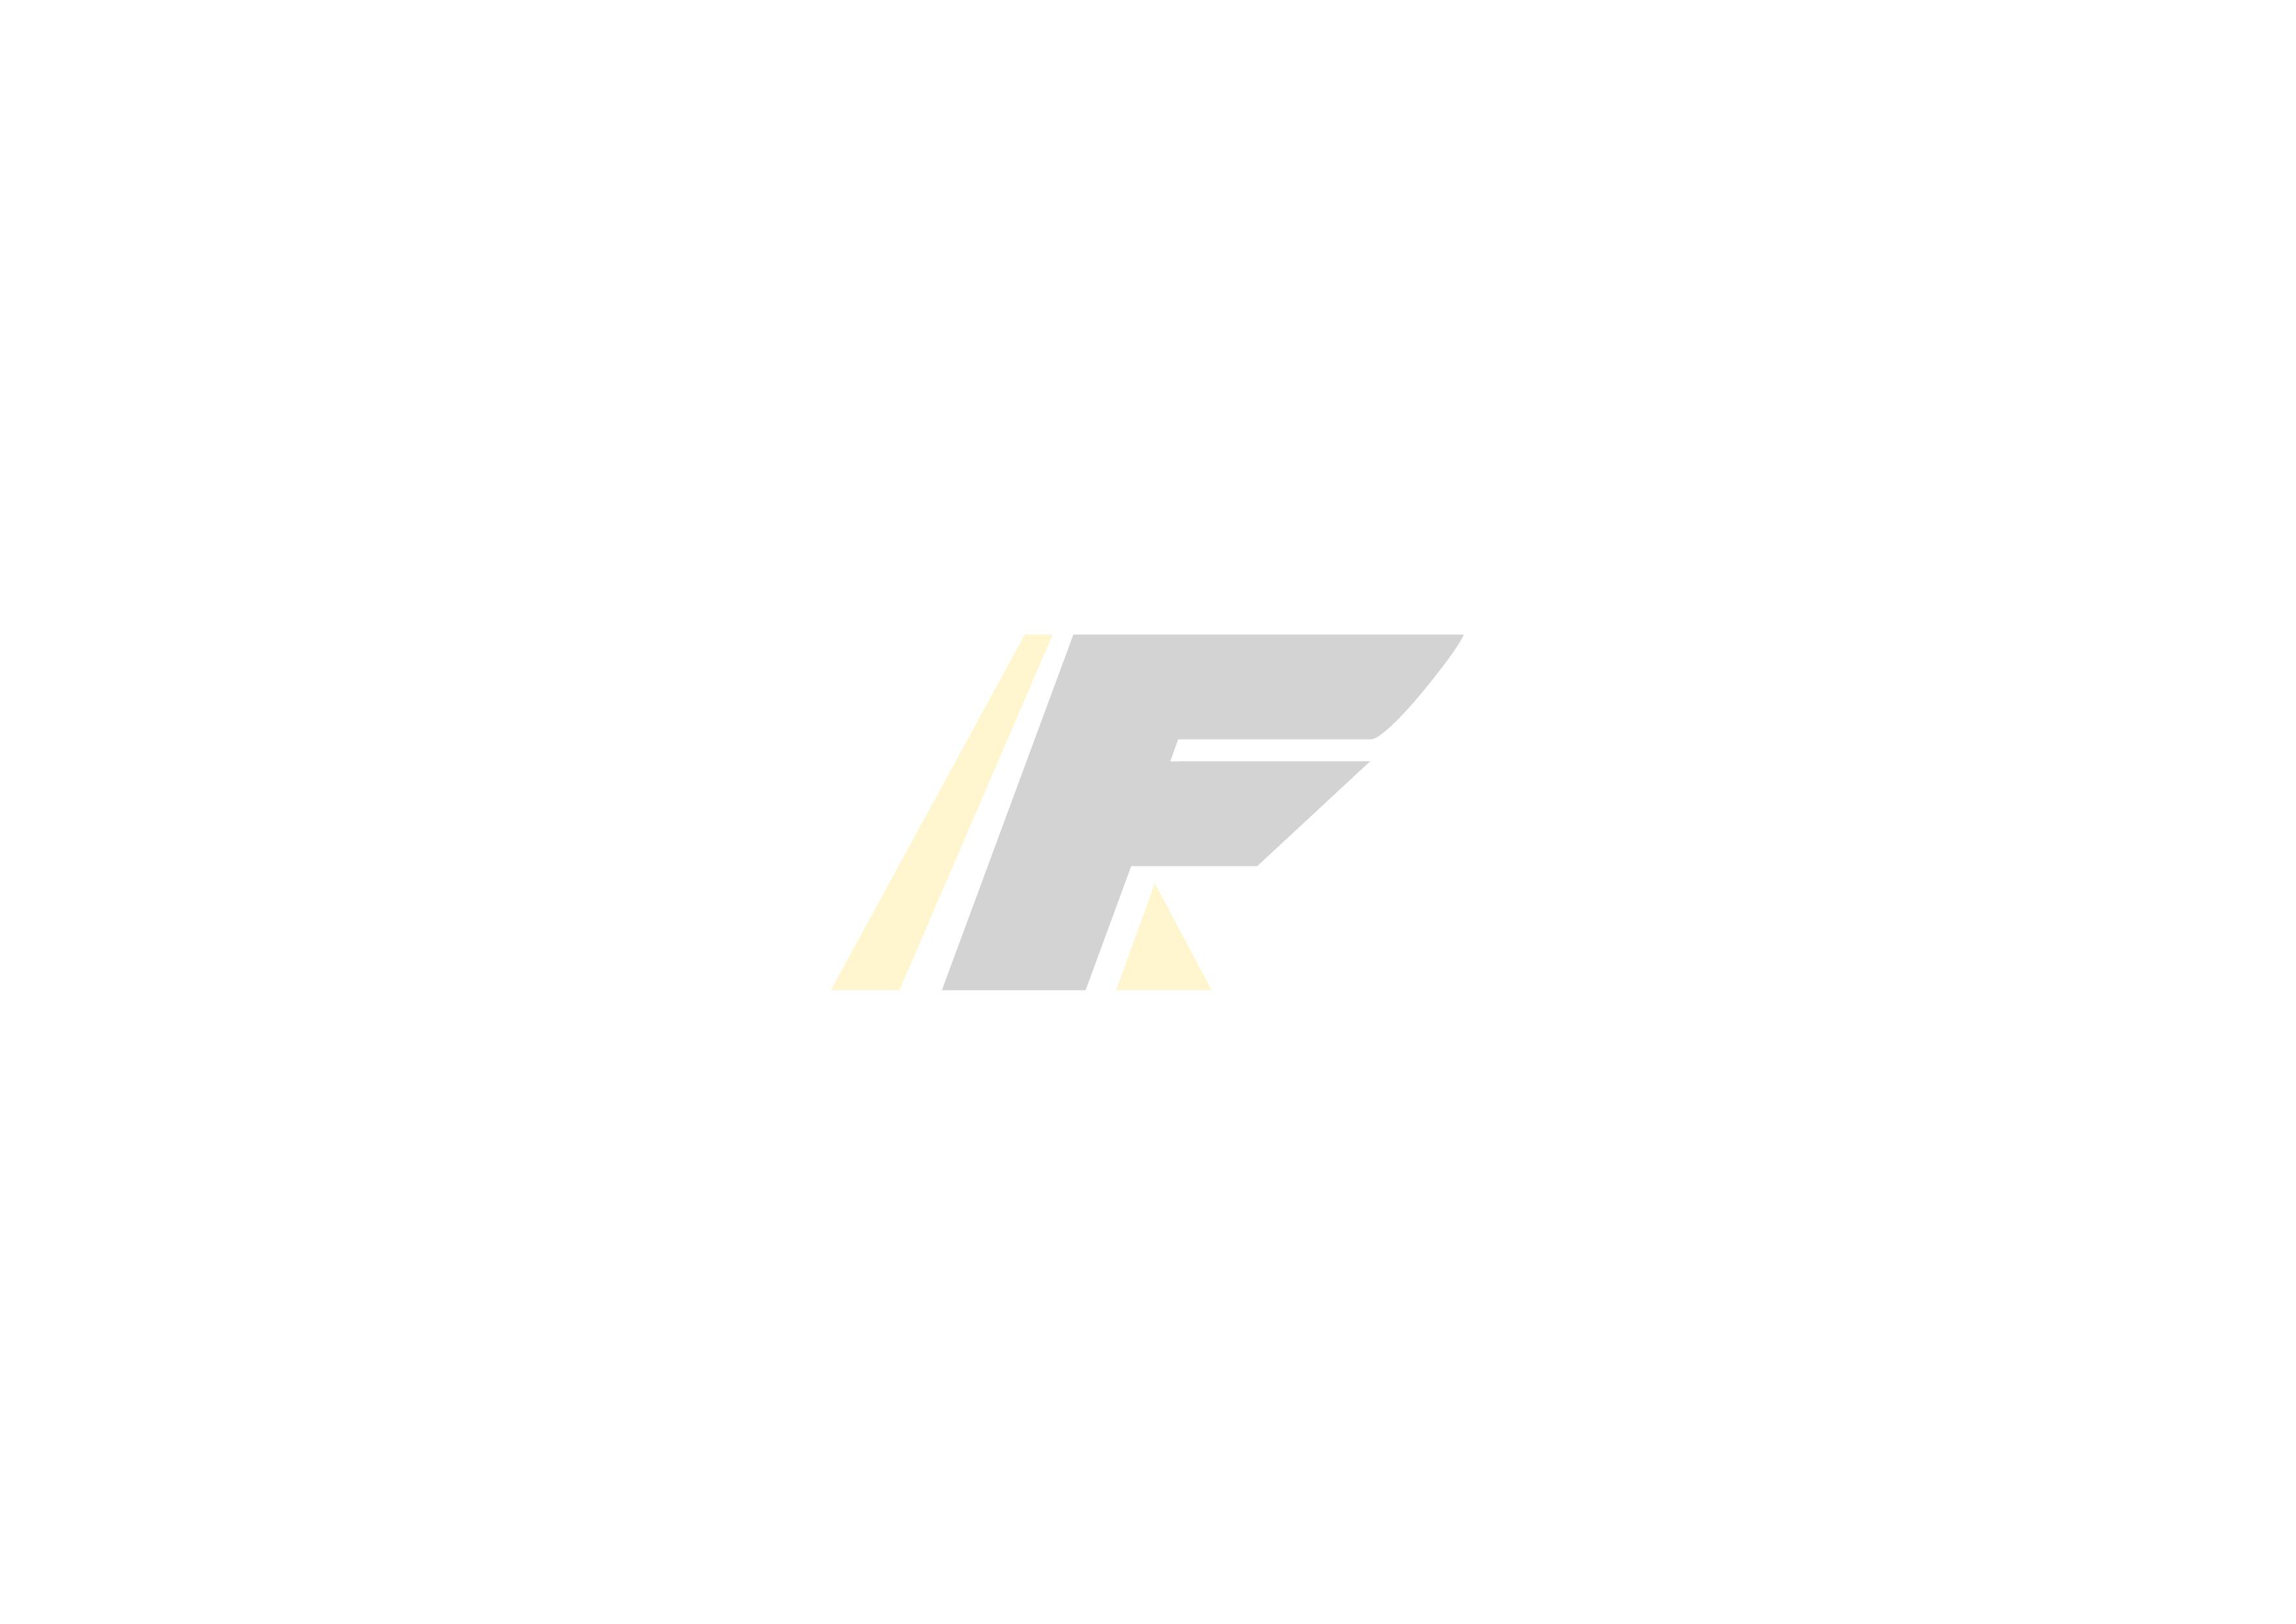 R&G Fork Protectors - Trimuph Street Triple / Daytona